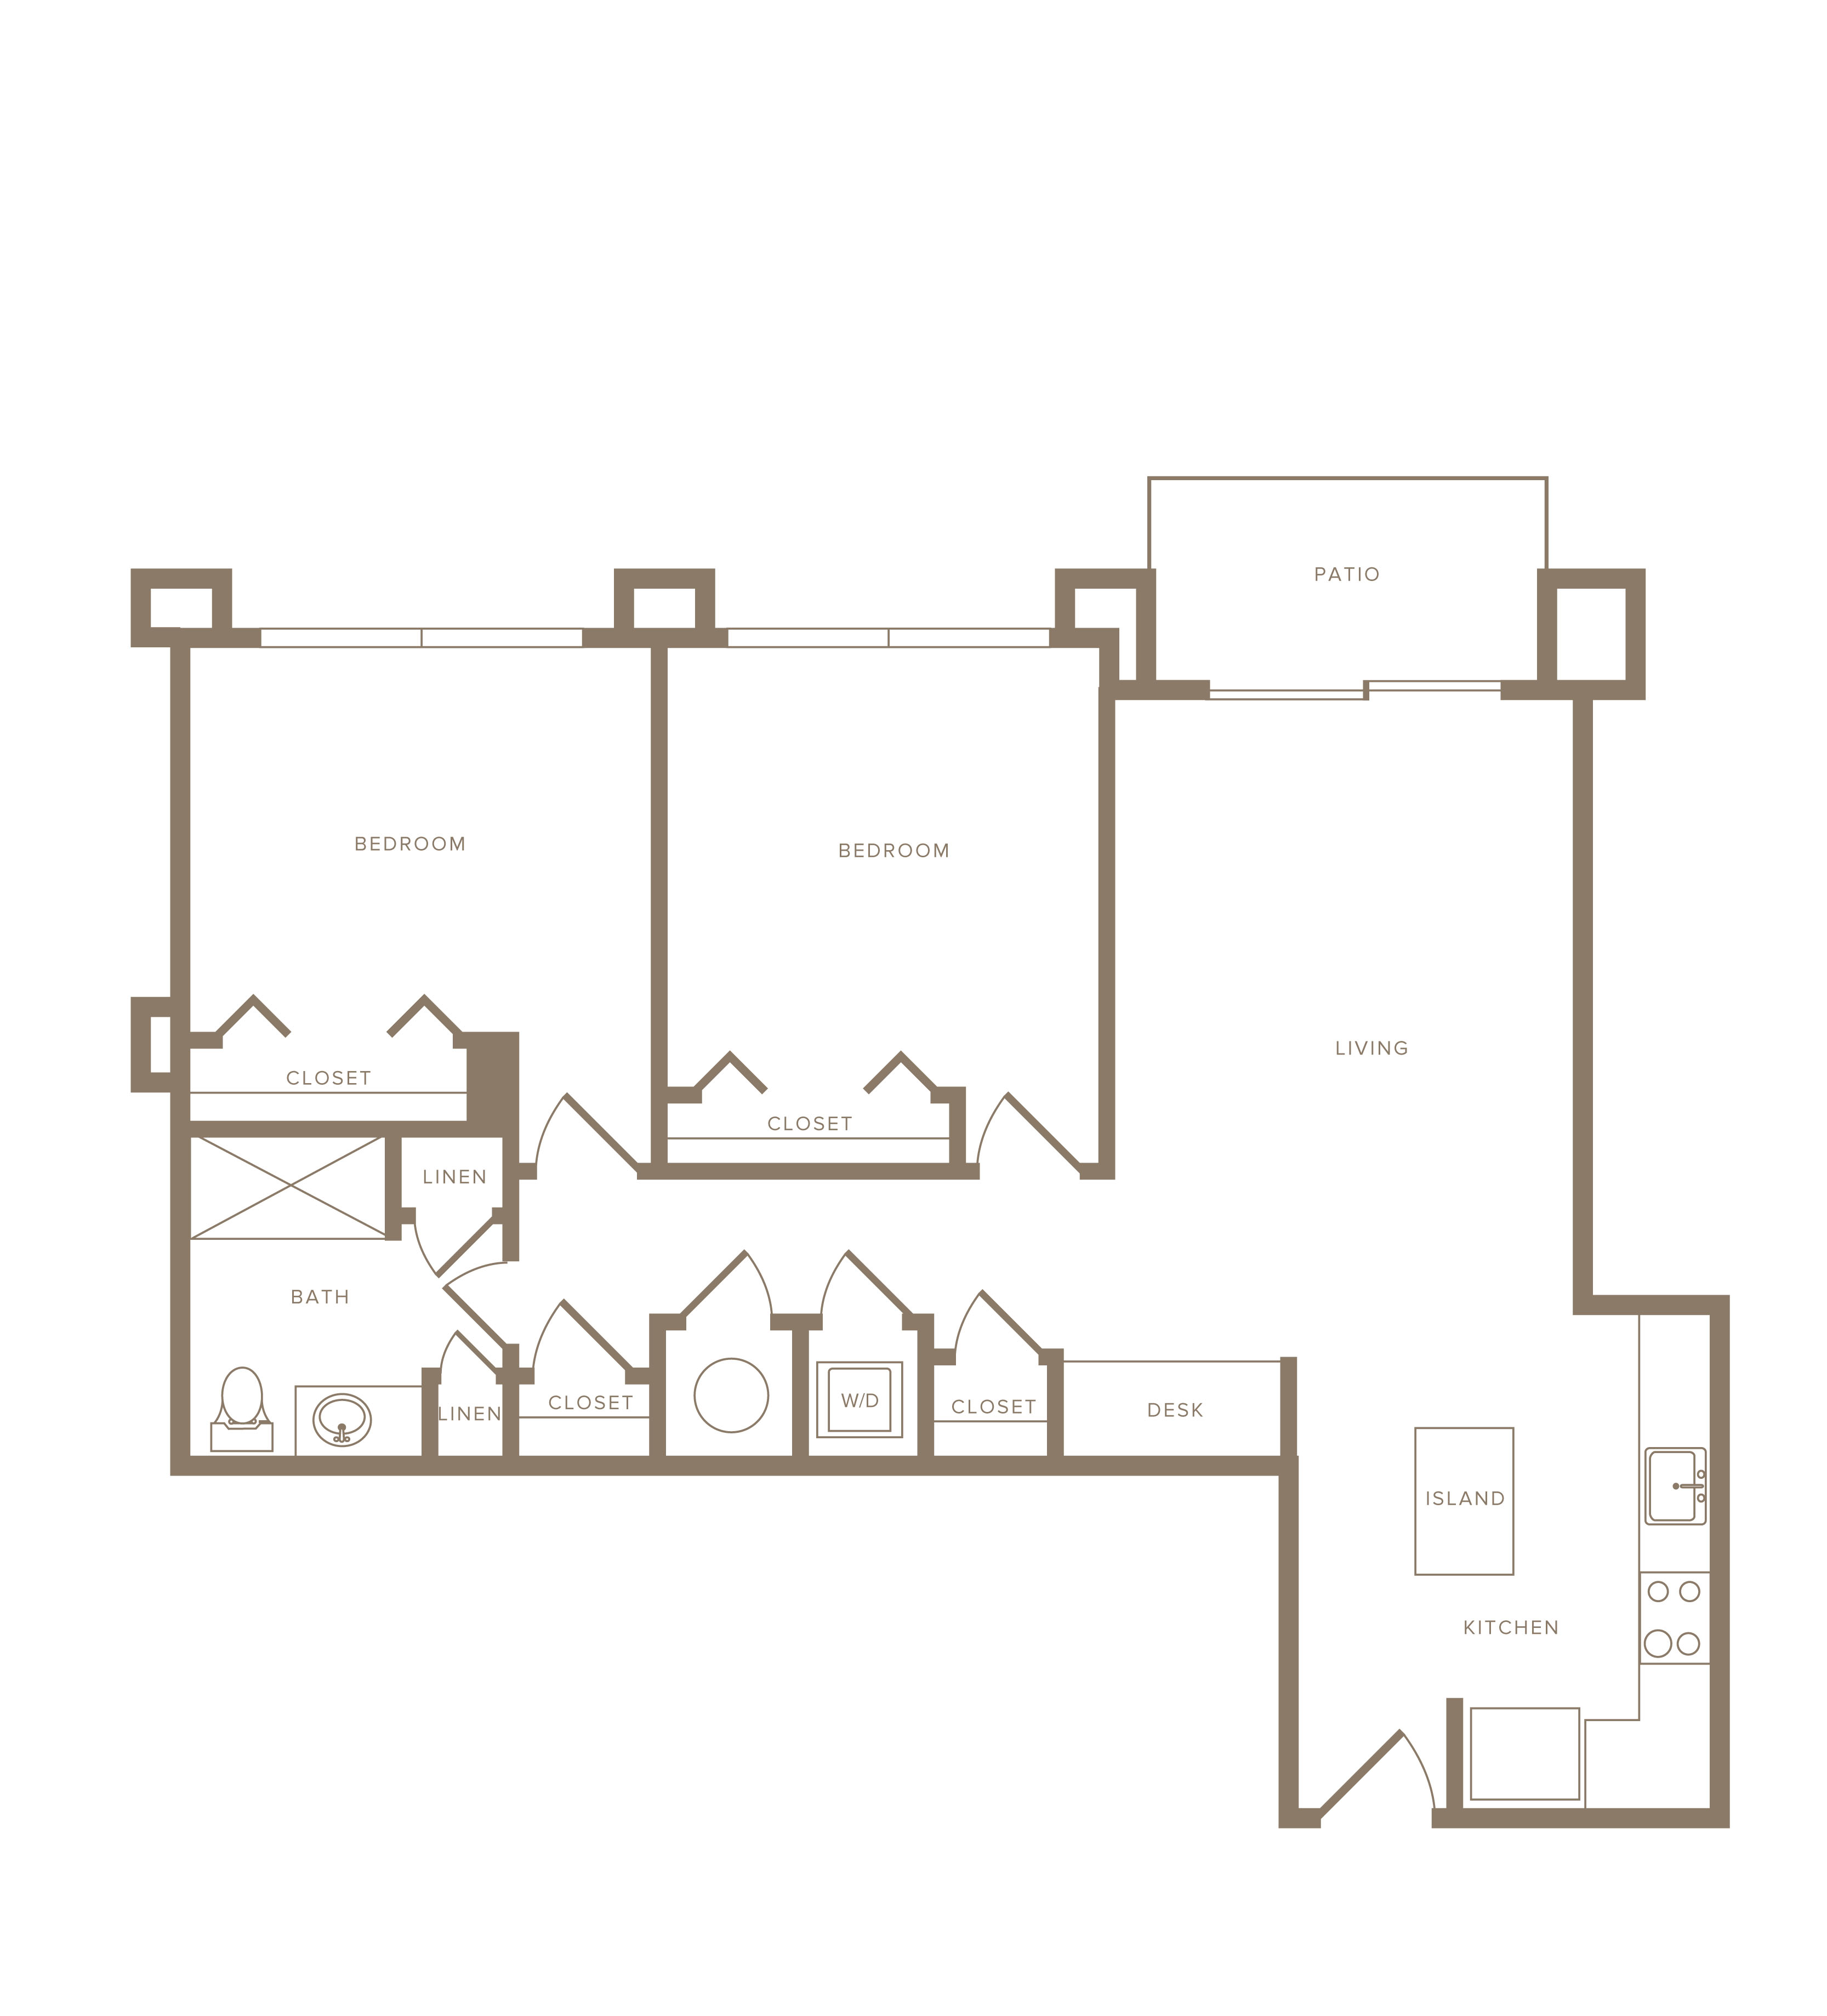 Apartment B-110 floorplan